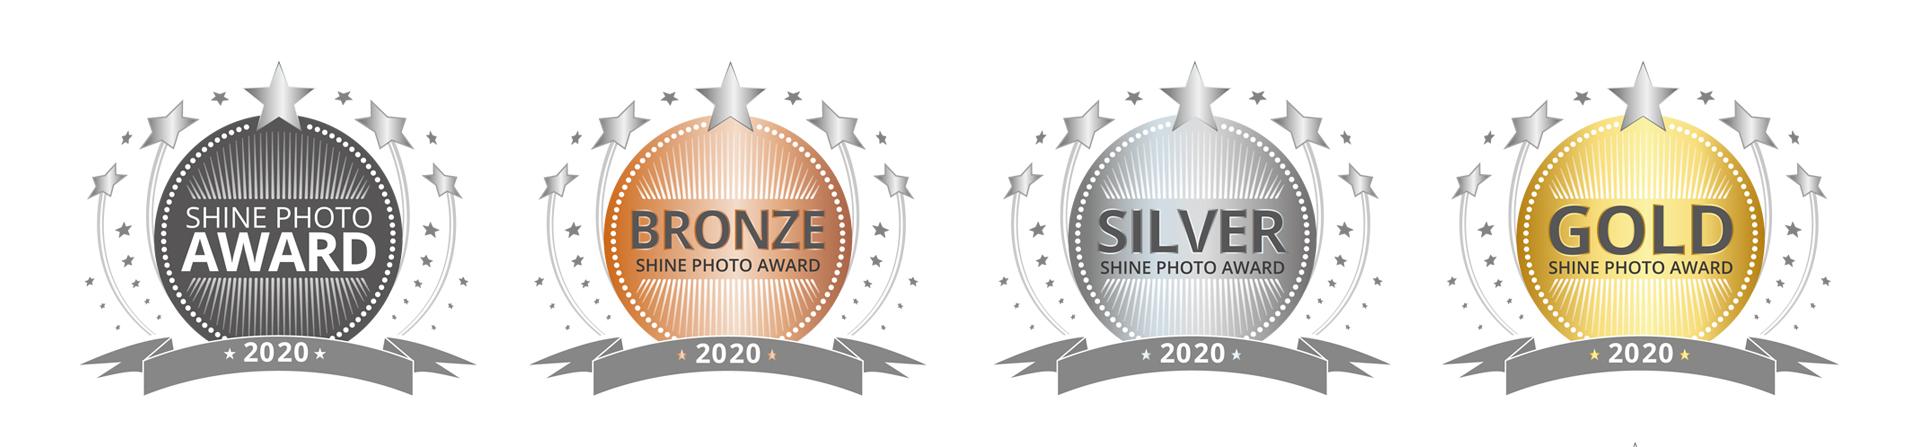 SHINE Photo Award - Emblems